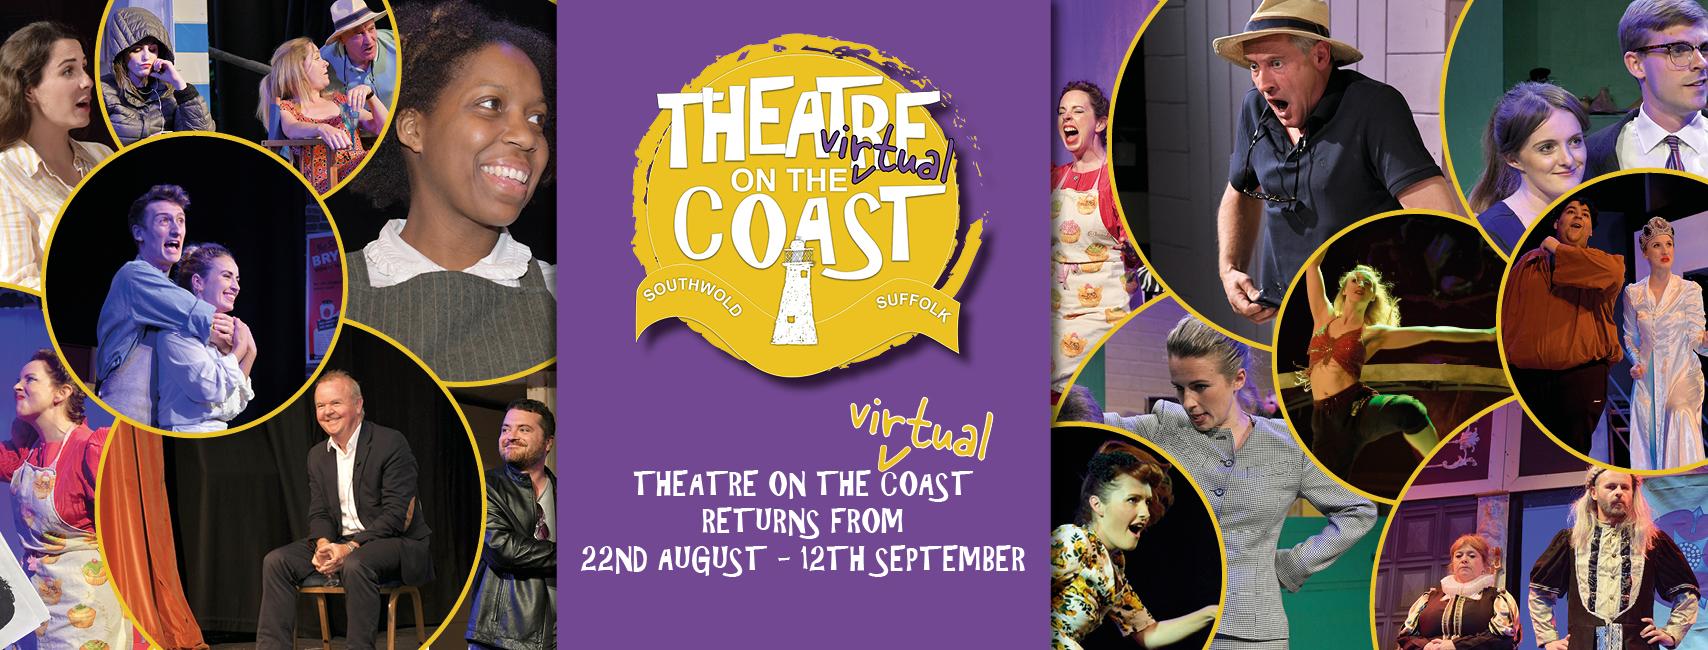 Theatre on the Virtual Coast